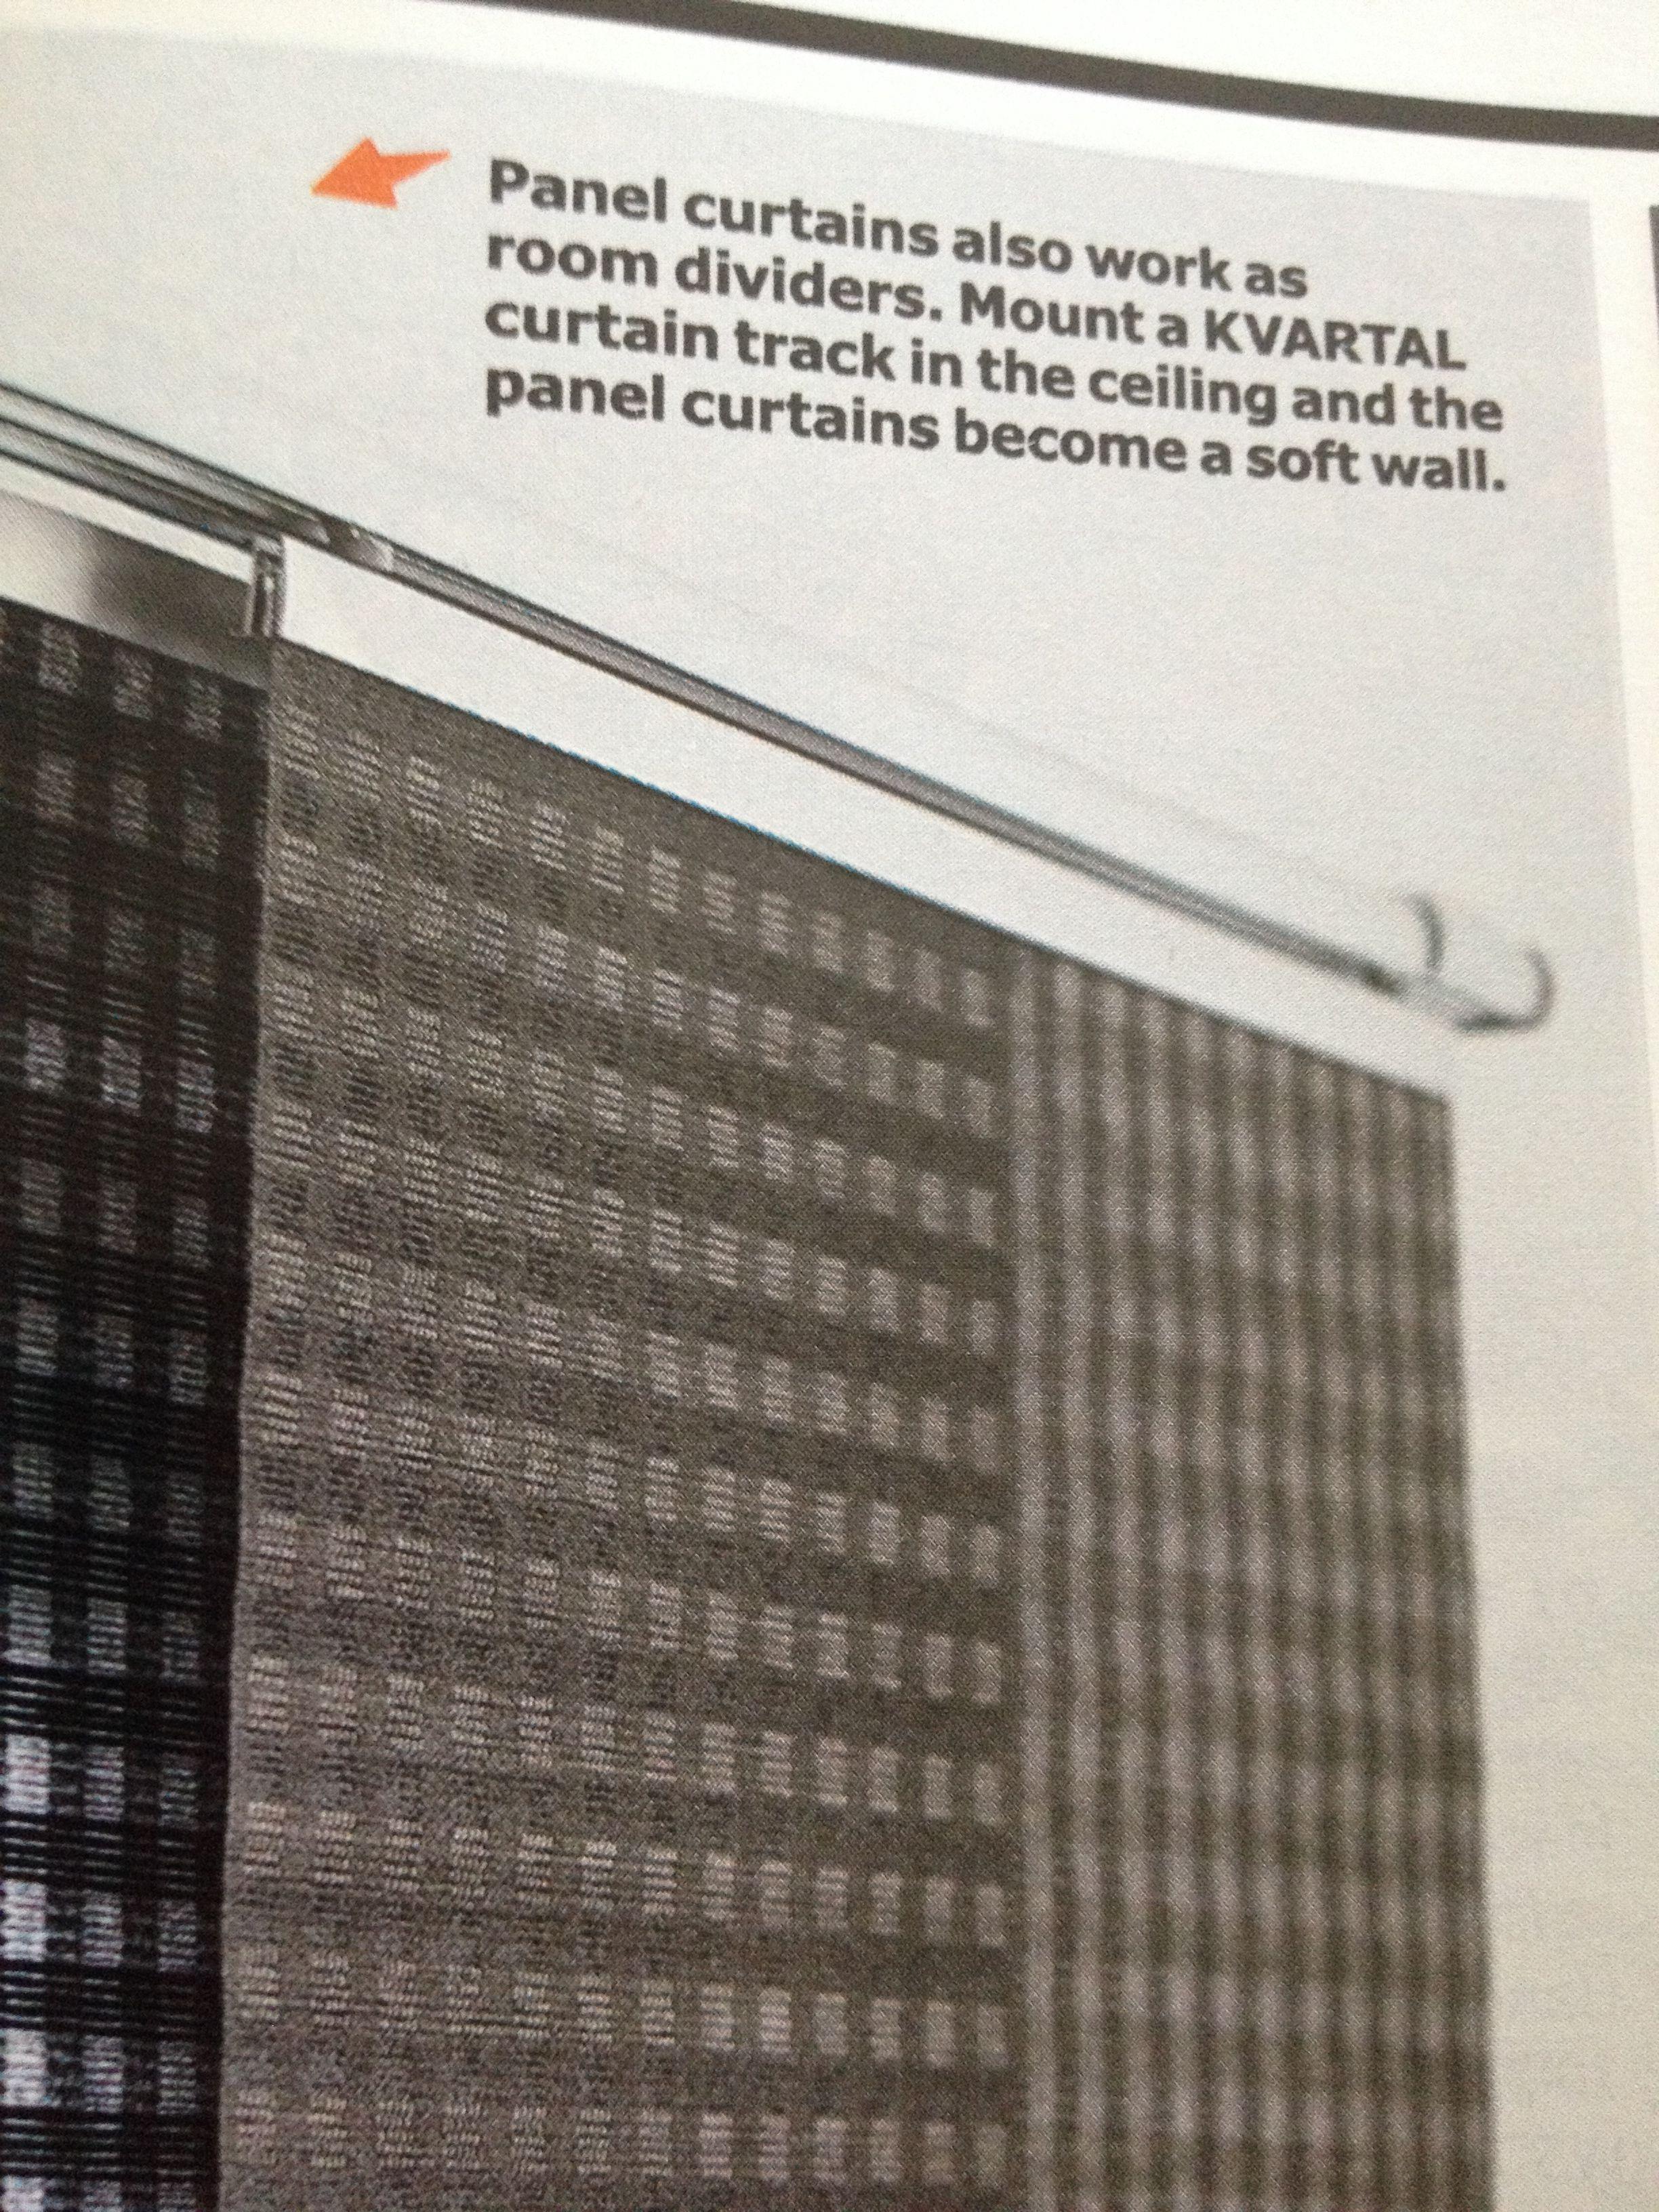 Ikea kvartal soft wall color textiles and decor pinterest for Binario kvartal ikea